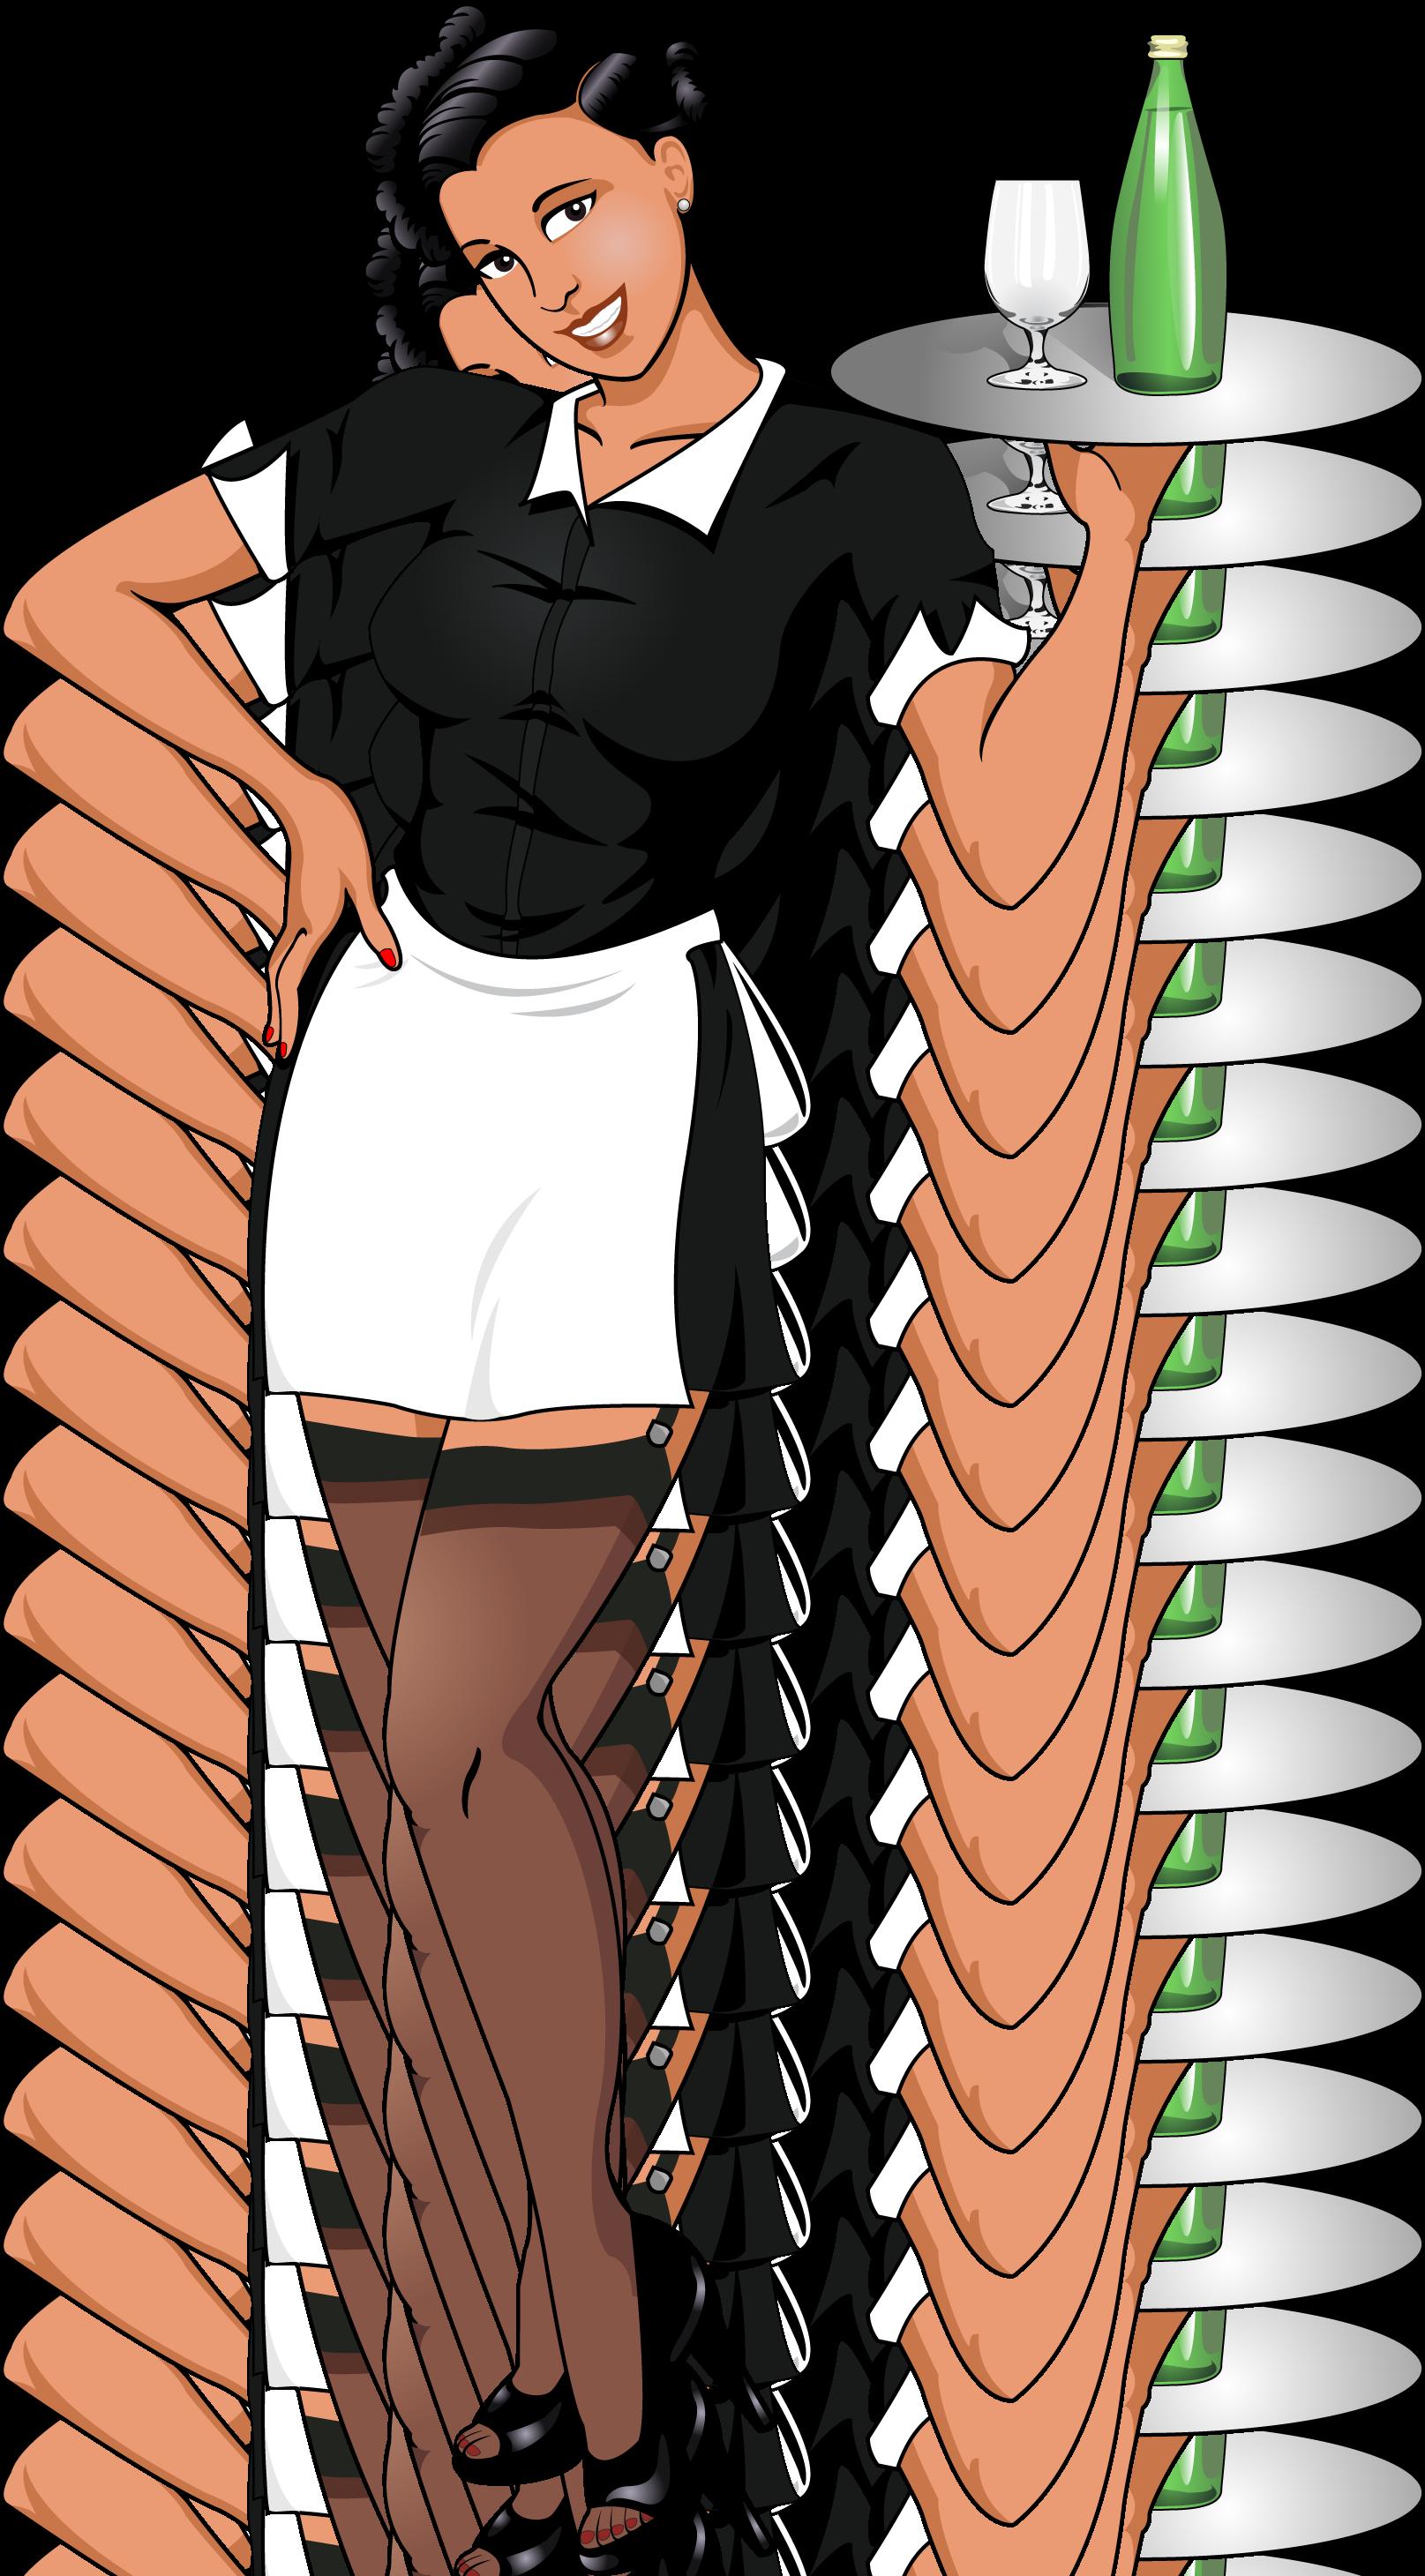 Josie food cart chalkboard. Waitress clipart bartender